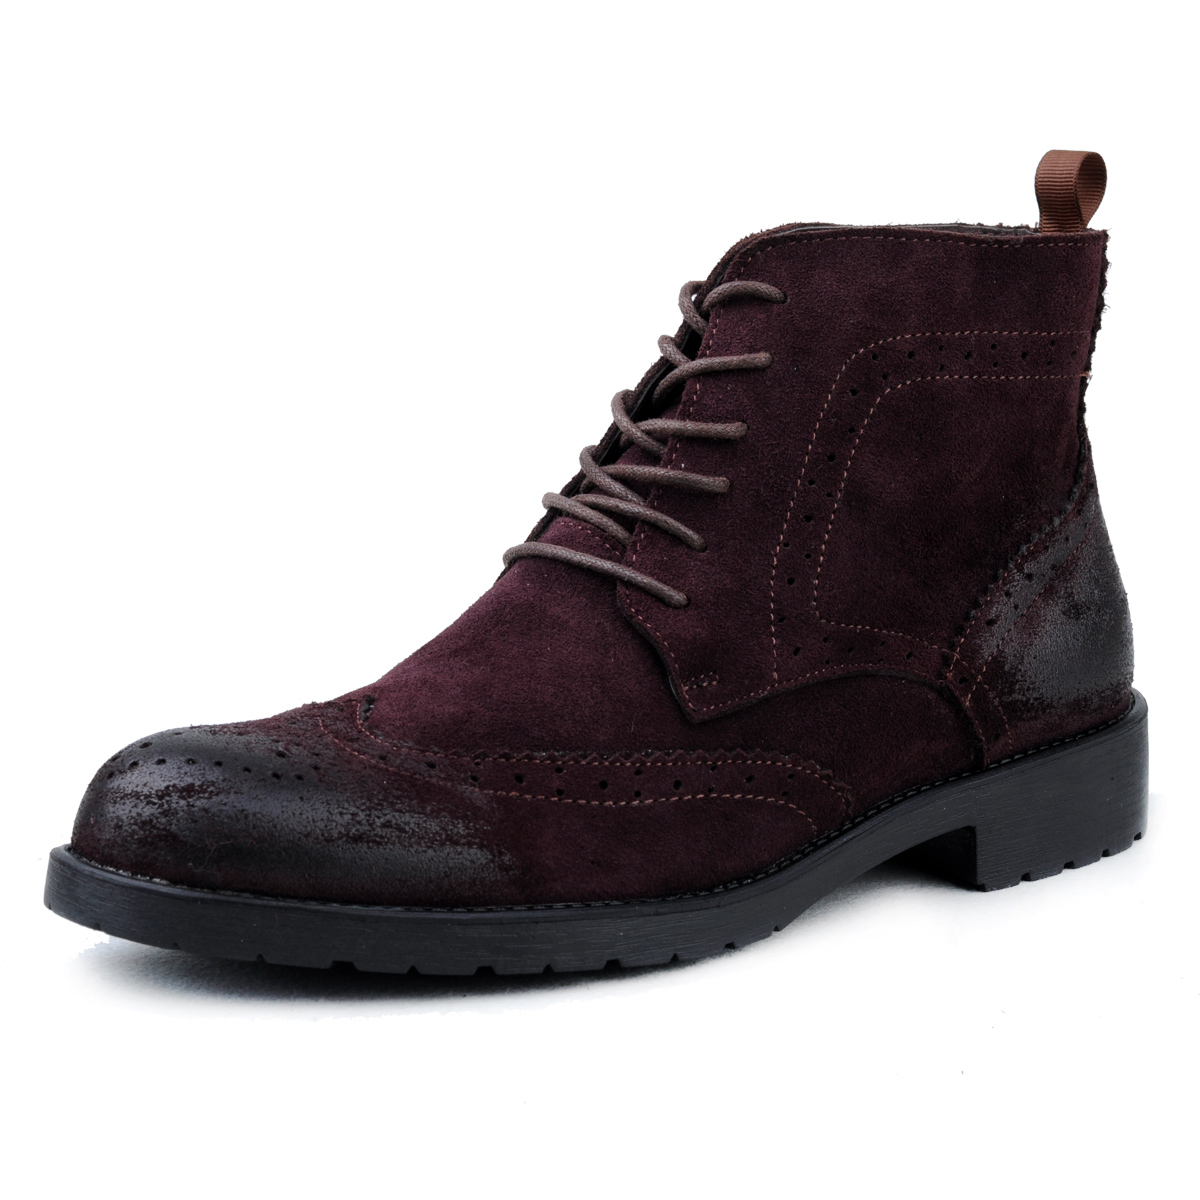 2016 freeshipping men ankle botas rain font b boots b font leather font b boots b